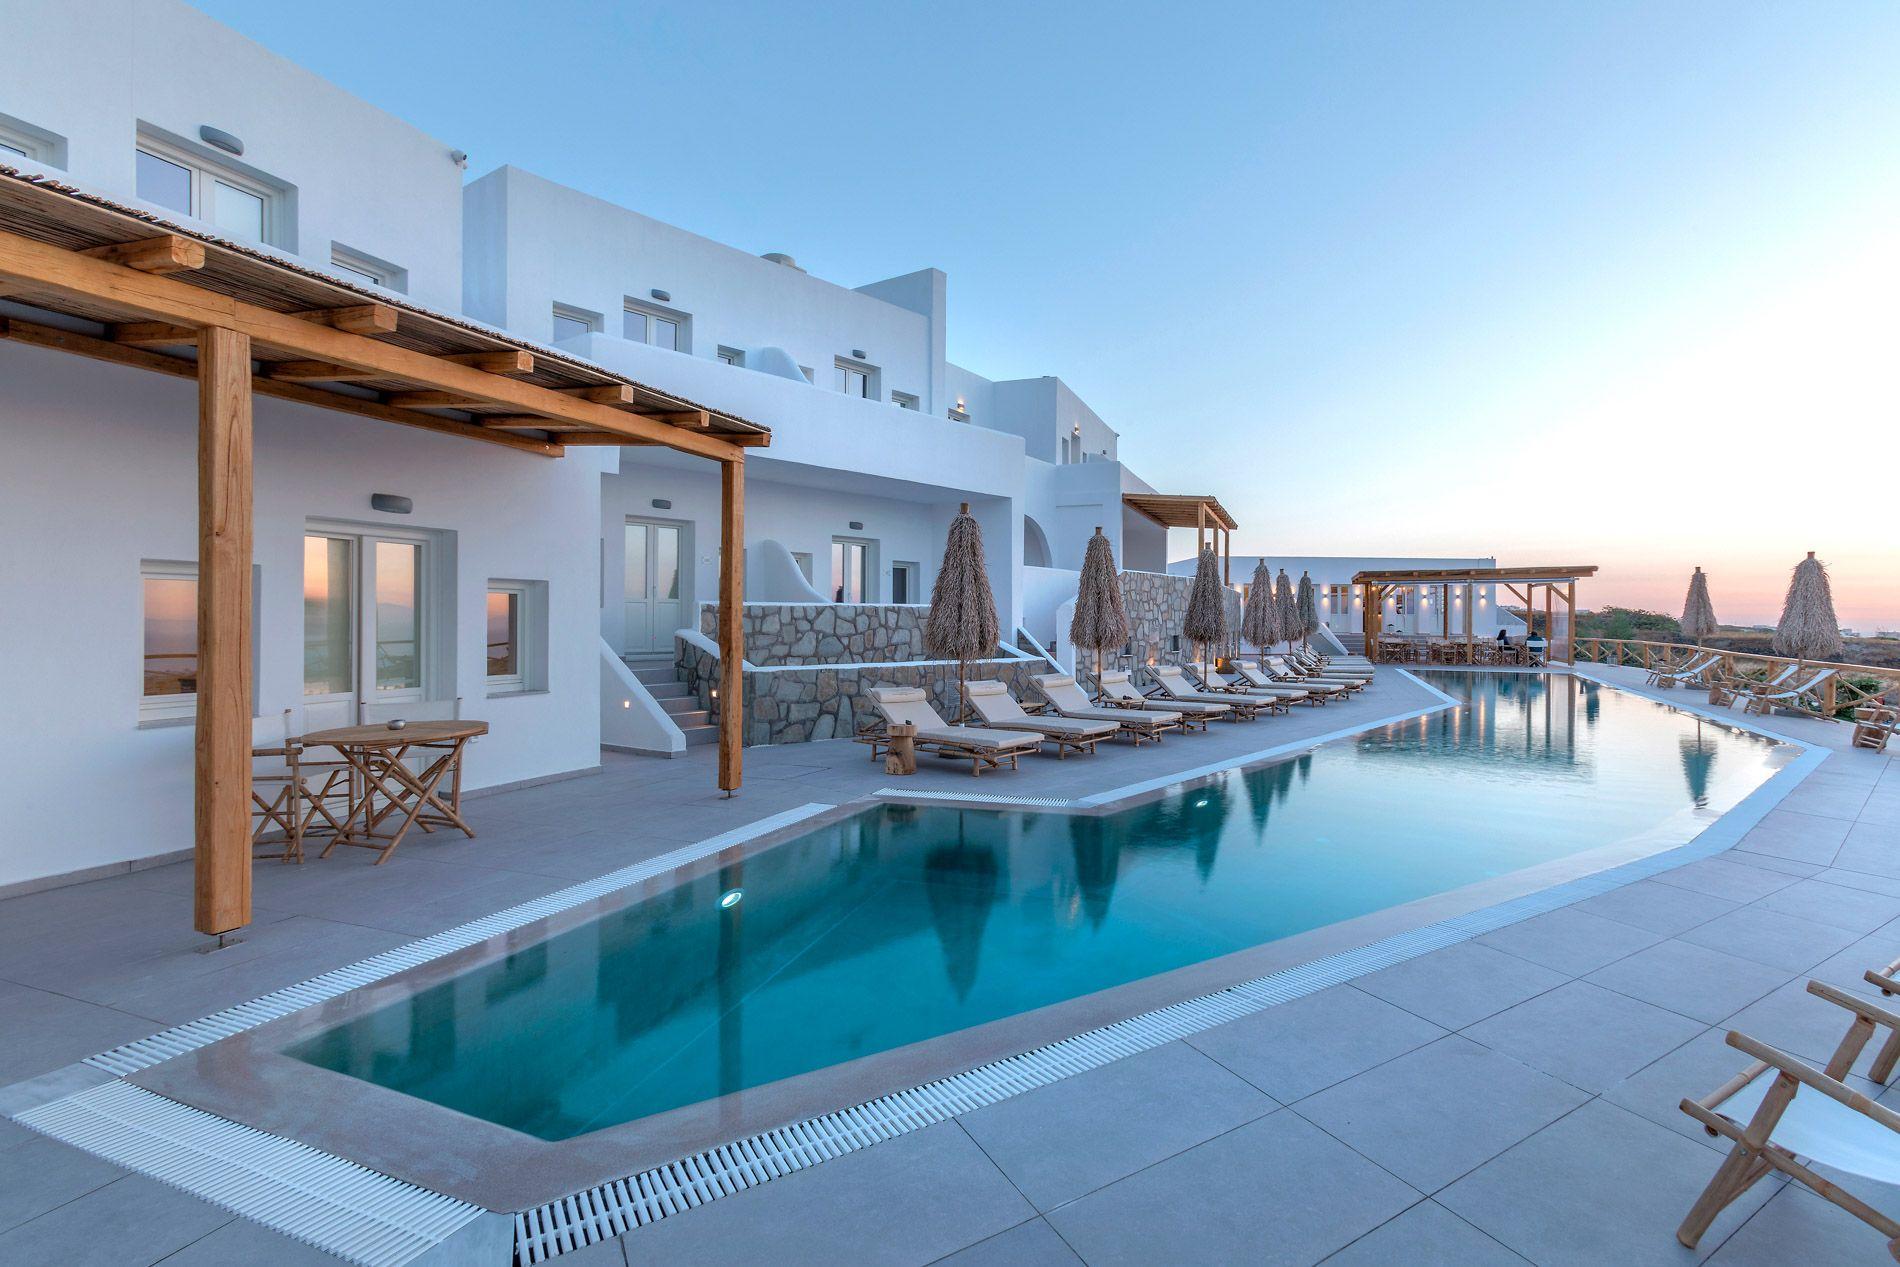 5* View Hotel by Secret Santorini - Σαντορίνη ✦ 2 Ημέρες (1 Διανυκτέρευση) ✦ 2 άτομα ✦ Πρωινό ✦ 10/07/2020 έως 30/09/2020 ✦ Free WiFi!